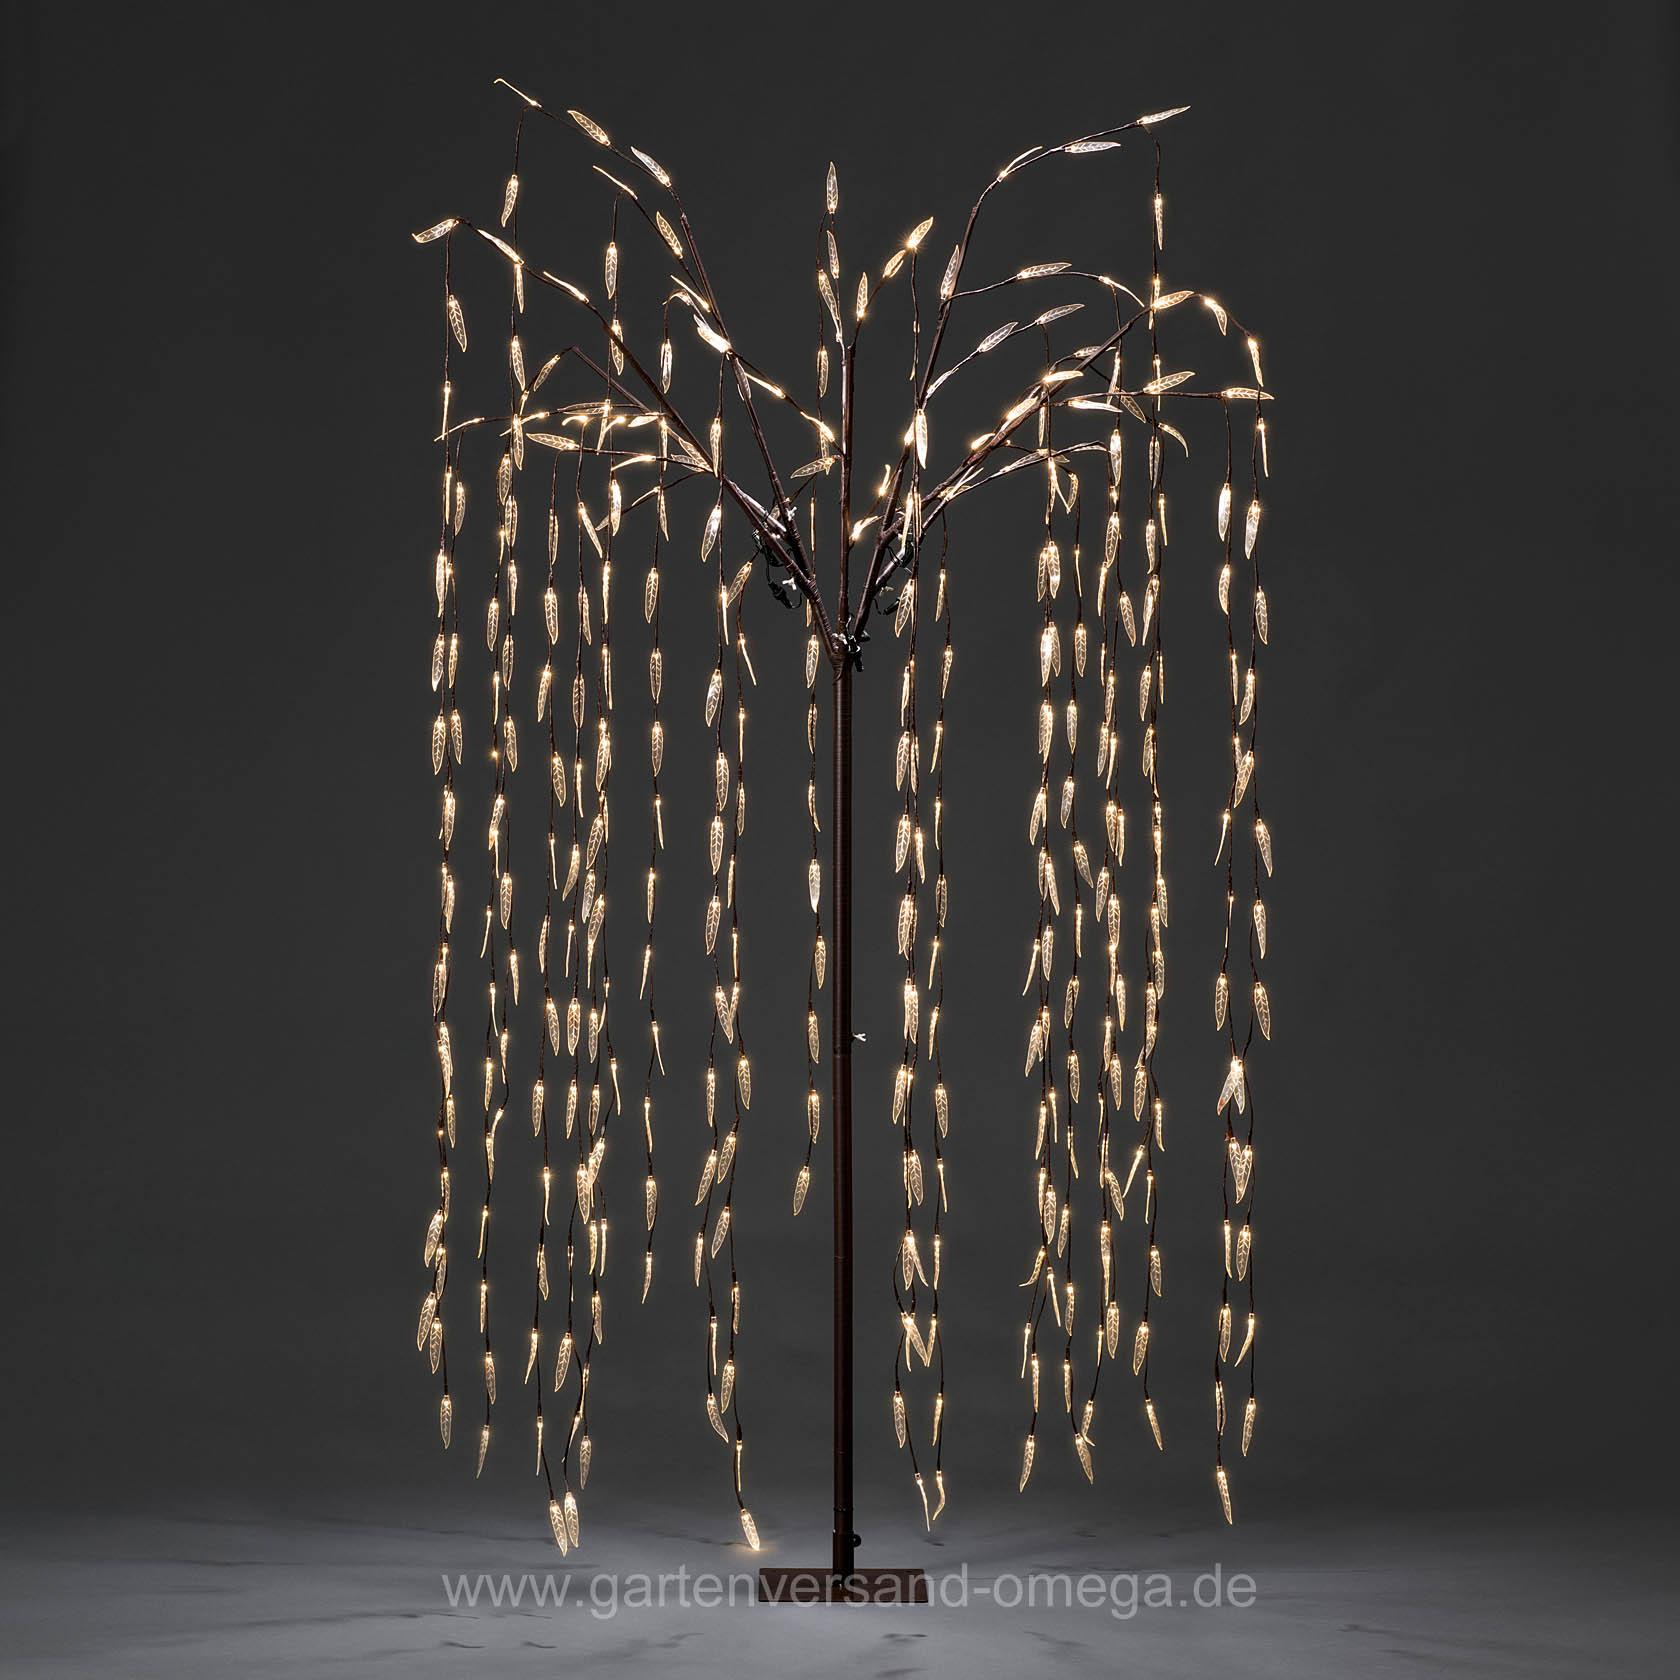 led trauerweide 250cm gro e weihnachtsbeleuchtung beleuchteter led baum lichterbaum. Black Bedroom Furniture Sets. Home Design Ideas